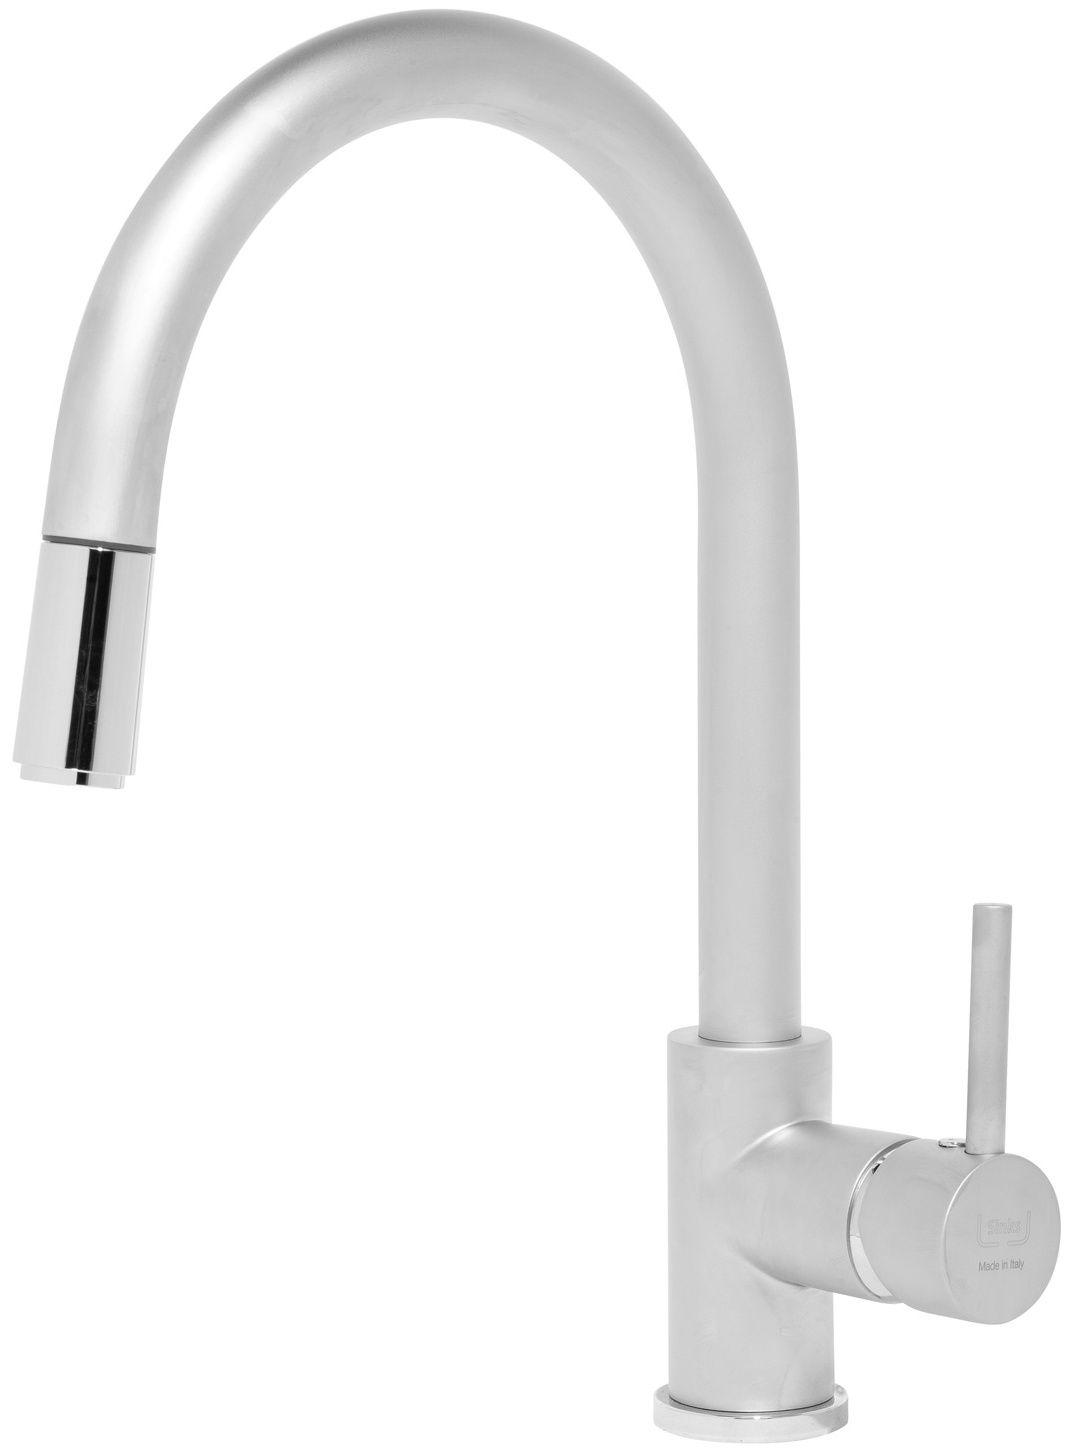 Kuchyňská baterie Sinks Mix 35 P Chrom - matný